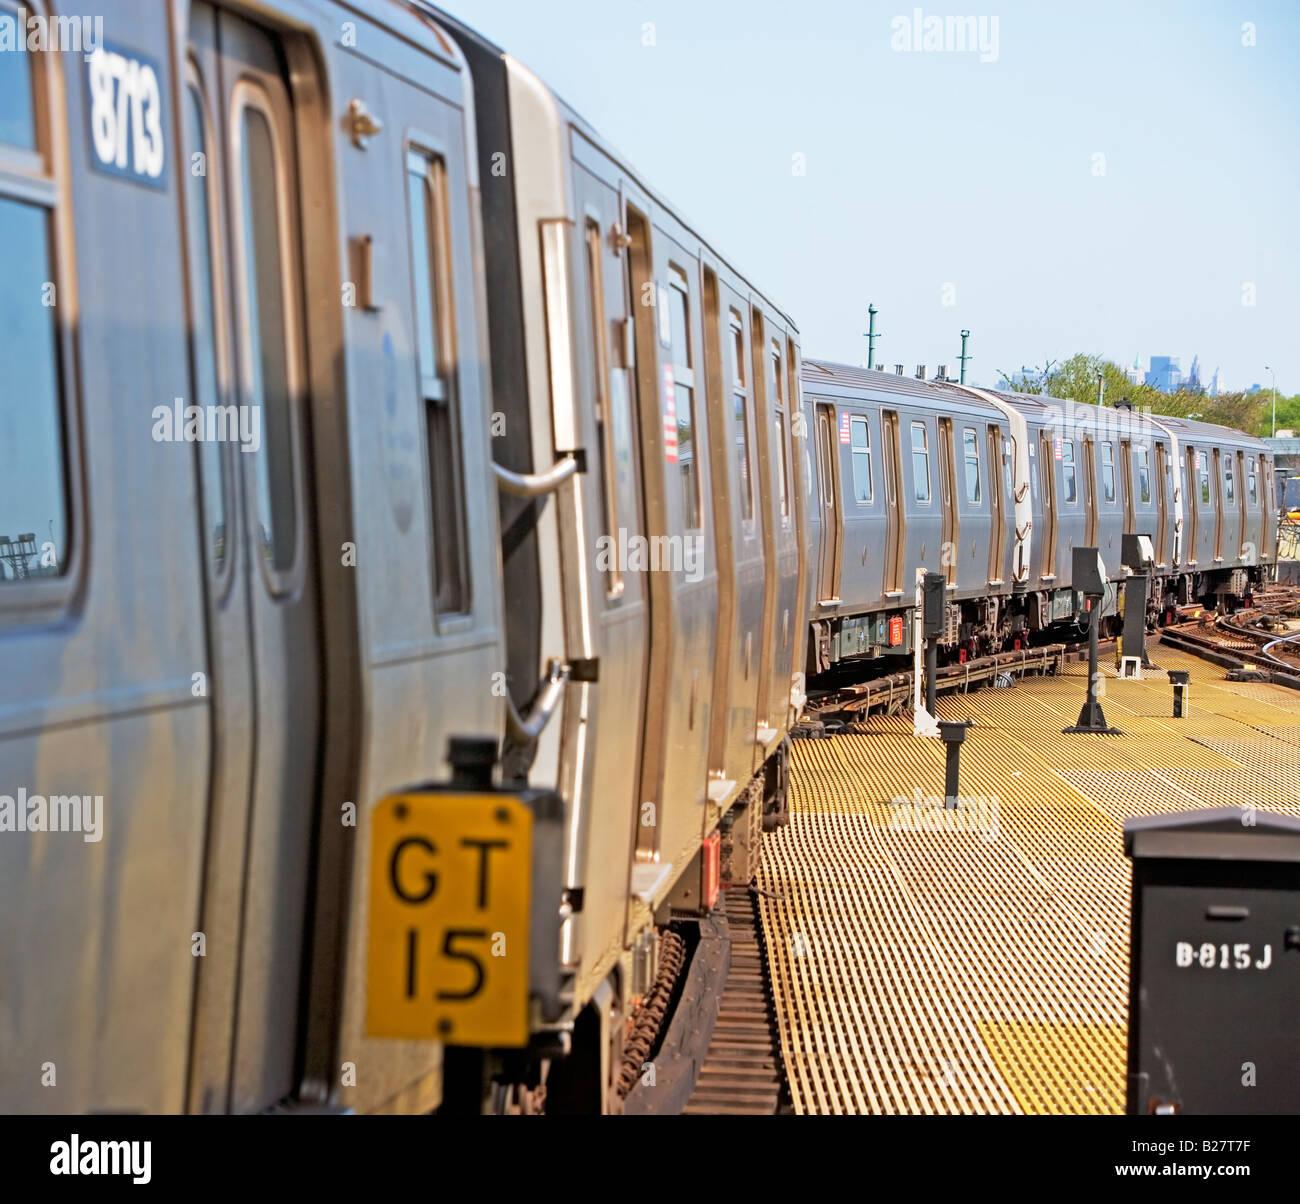 Subway train, New York City, New York, United States - Stock Image